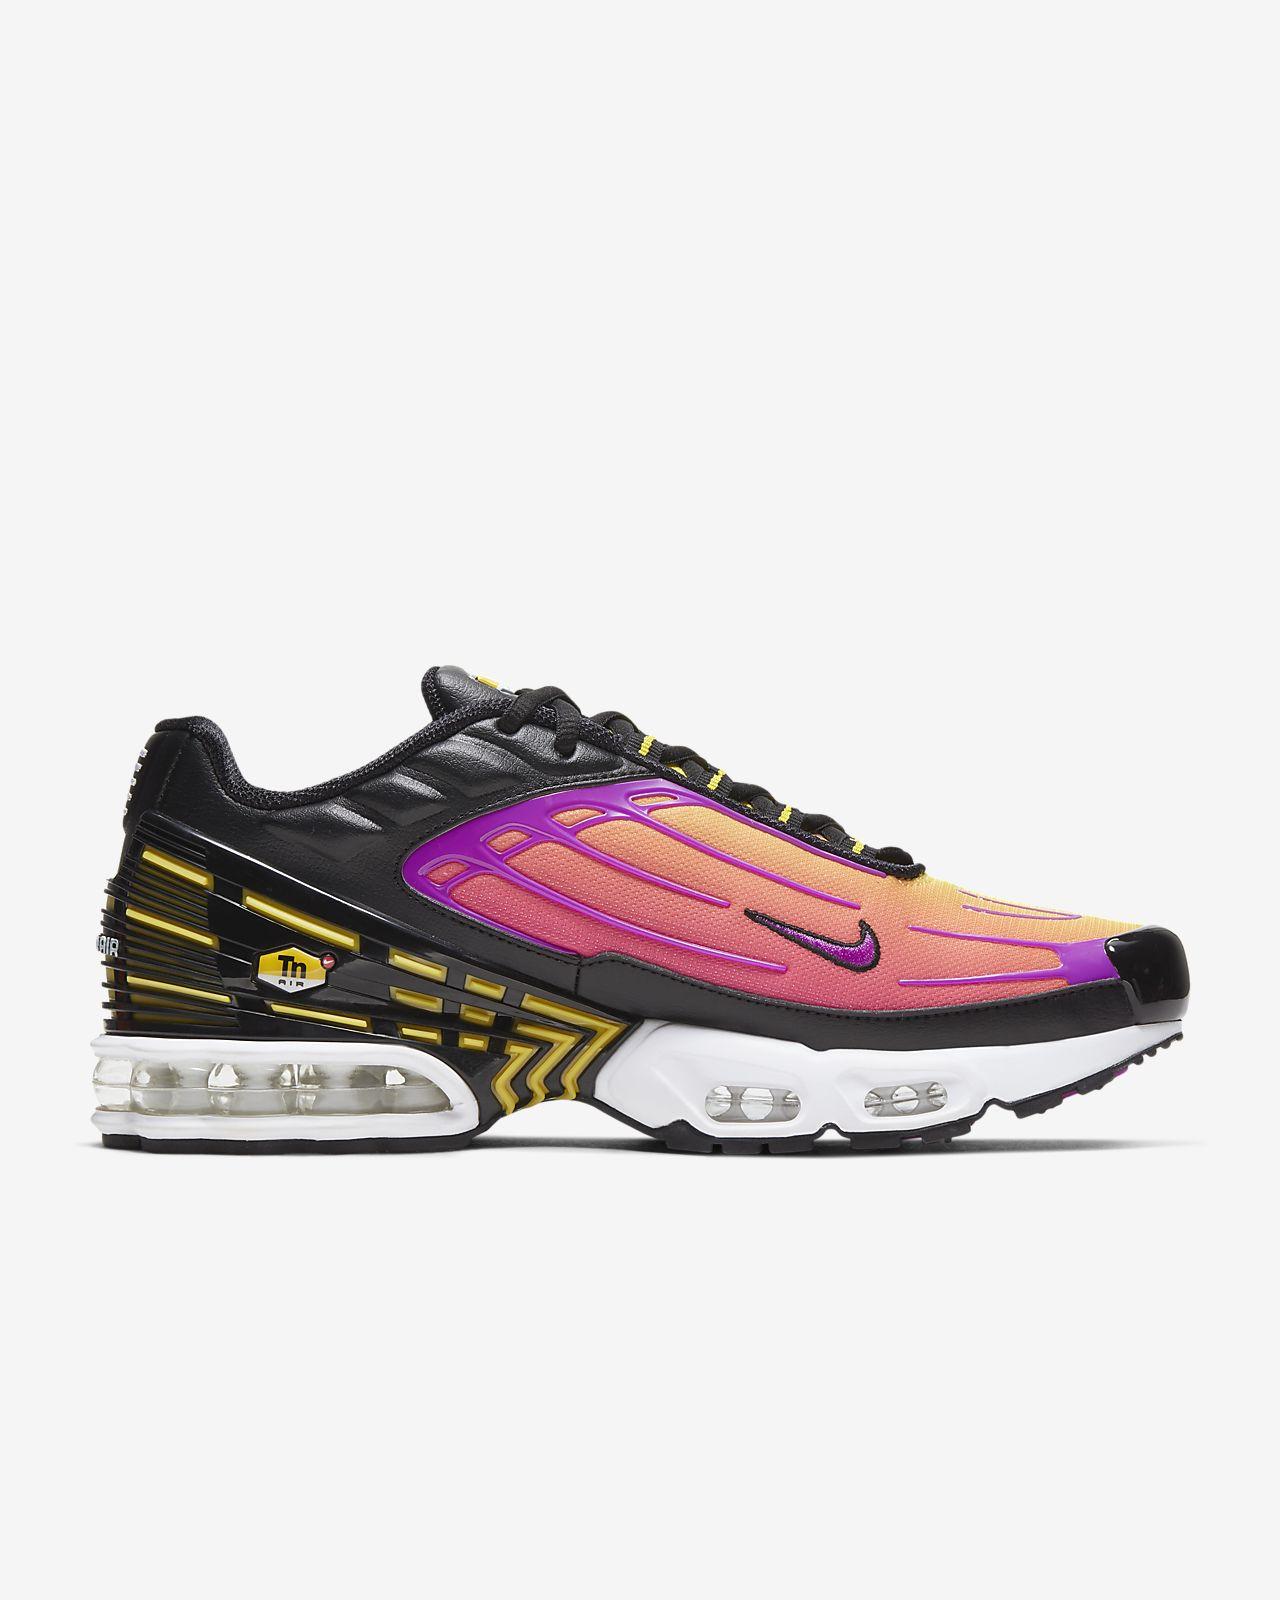 Nike is Bringing Back the Air Max Plus